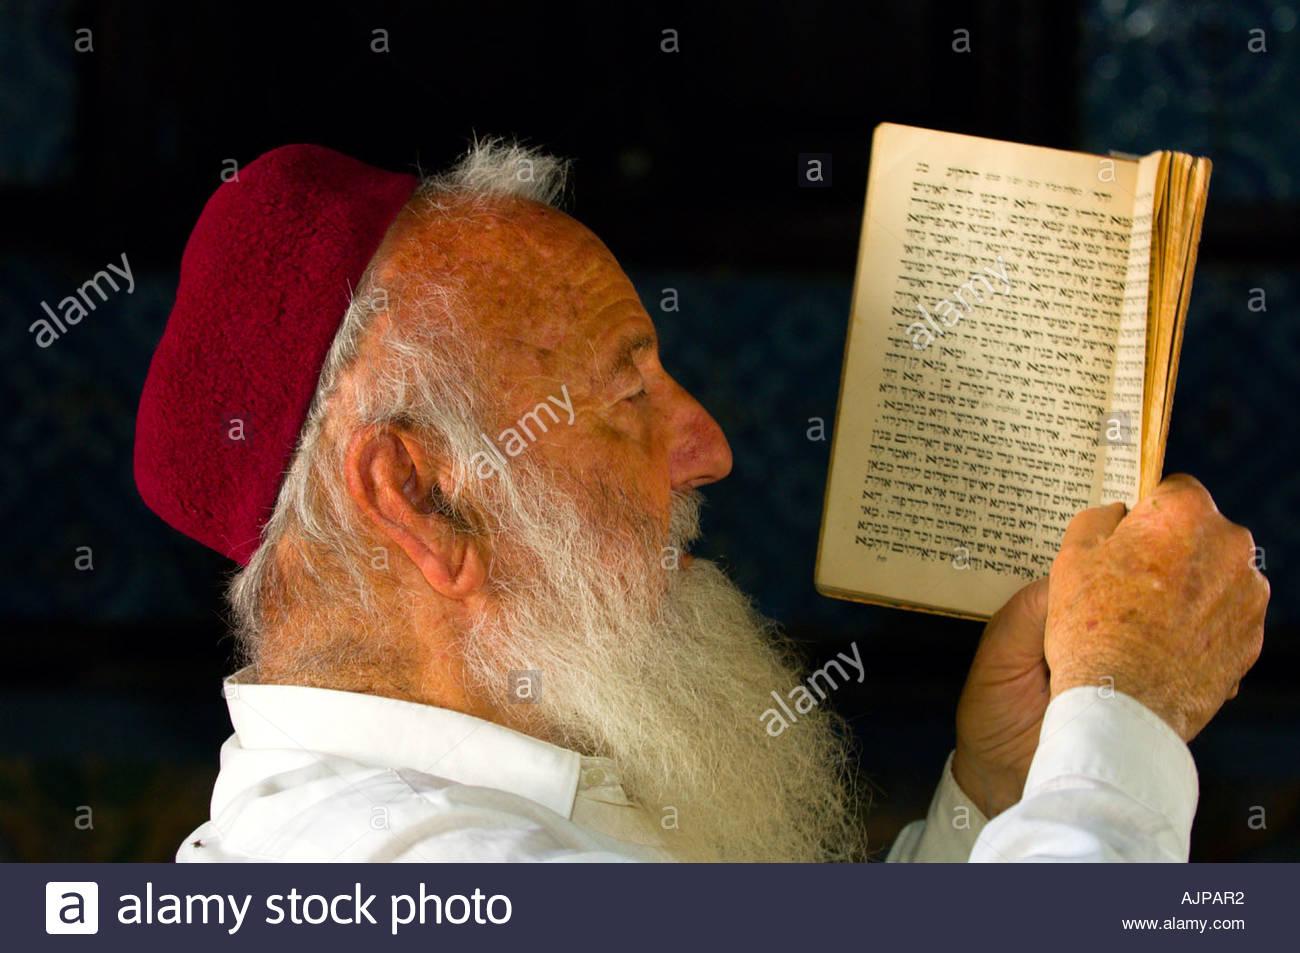 Rabbi reading siddur (prayer book), El Ghriba Synagogue, Djerba Island, Tunisia - Stock Image